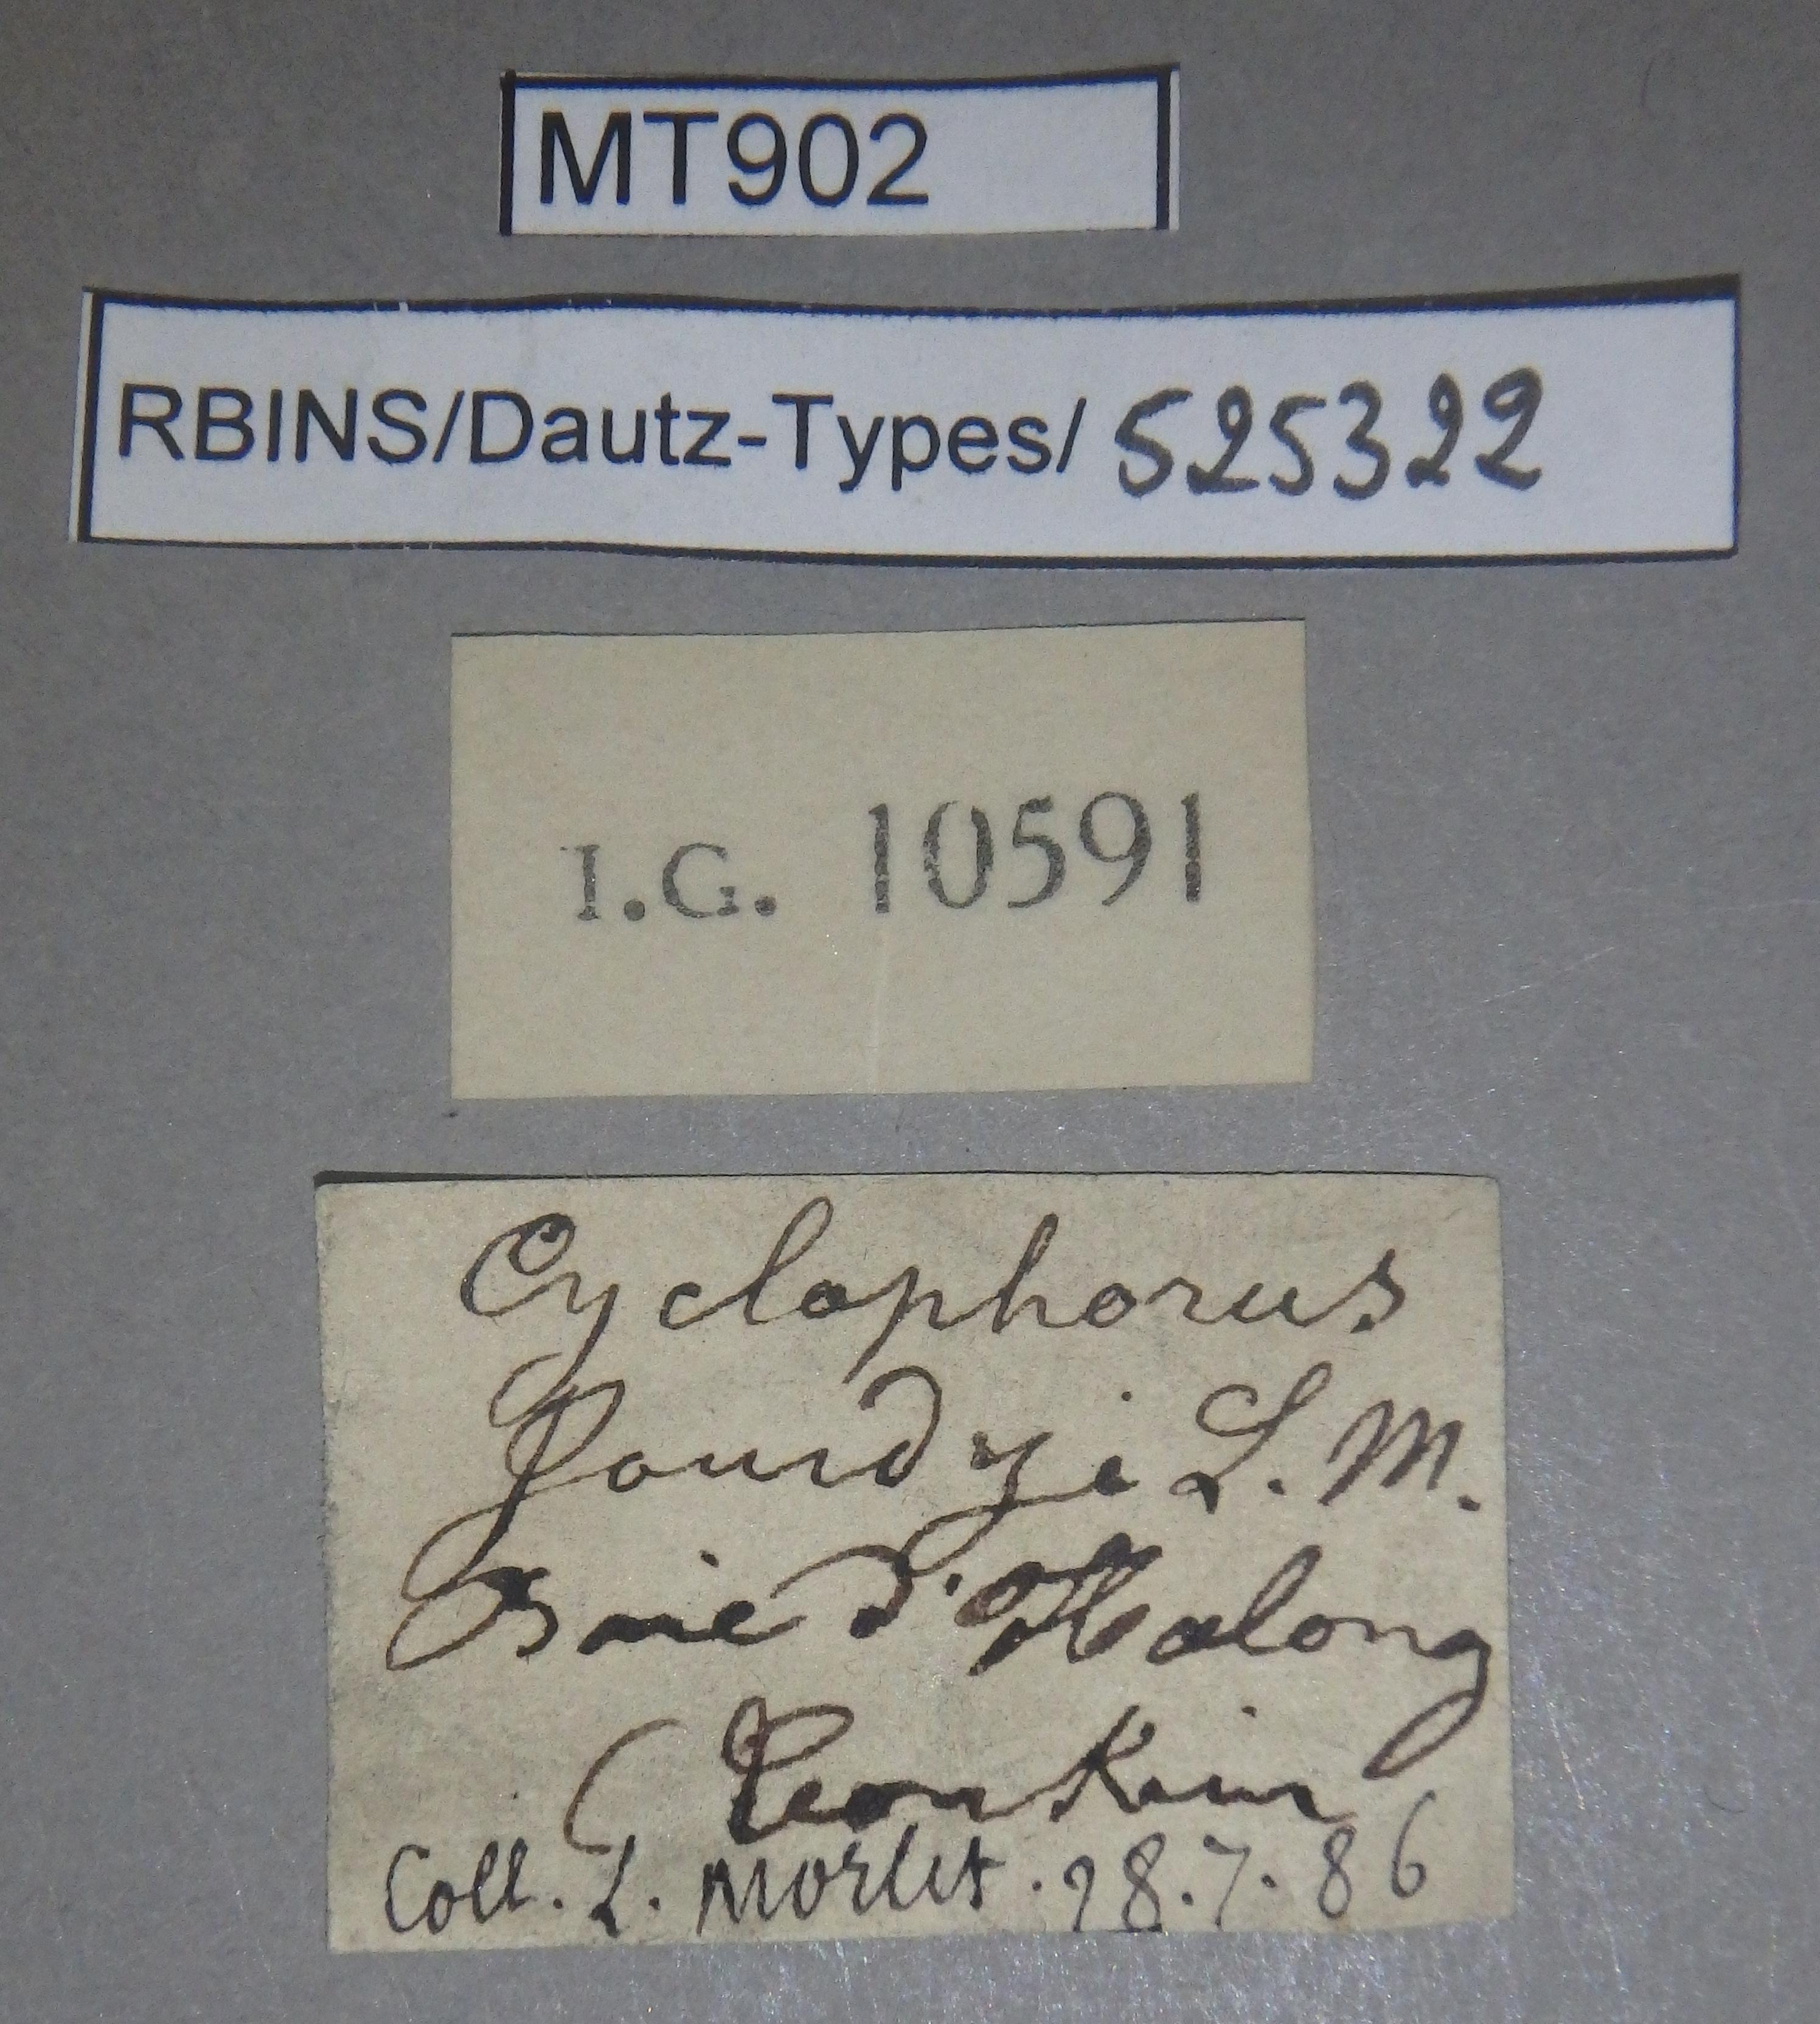 BE-RBINS-INV MT 902 Cyclophorus (Glossostylus) jourdyi pt Lb.jpg